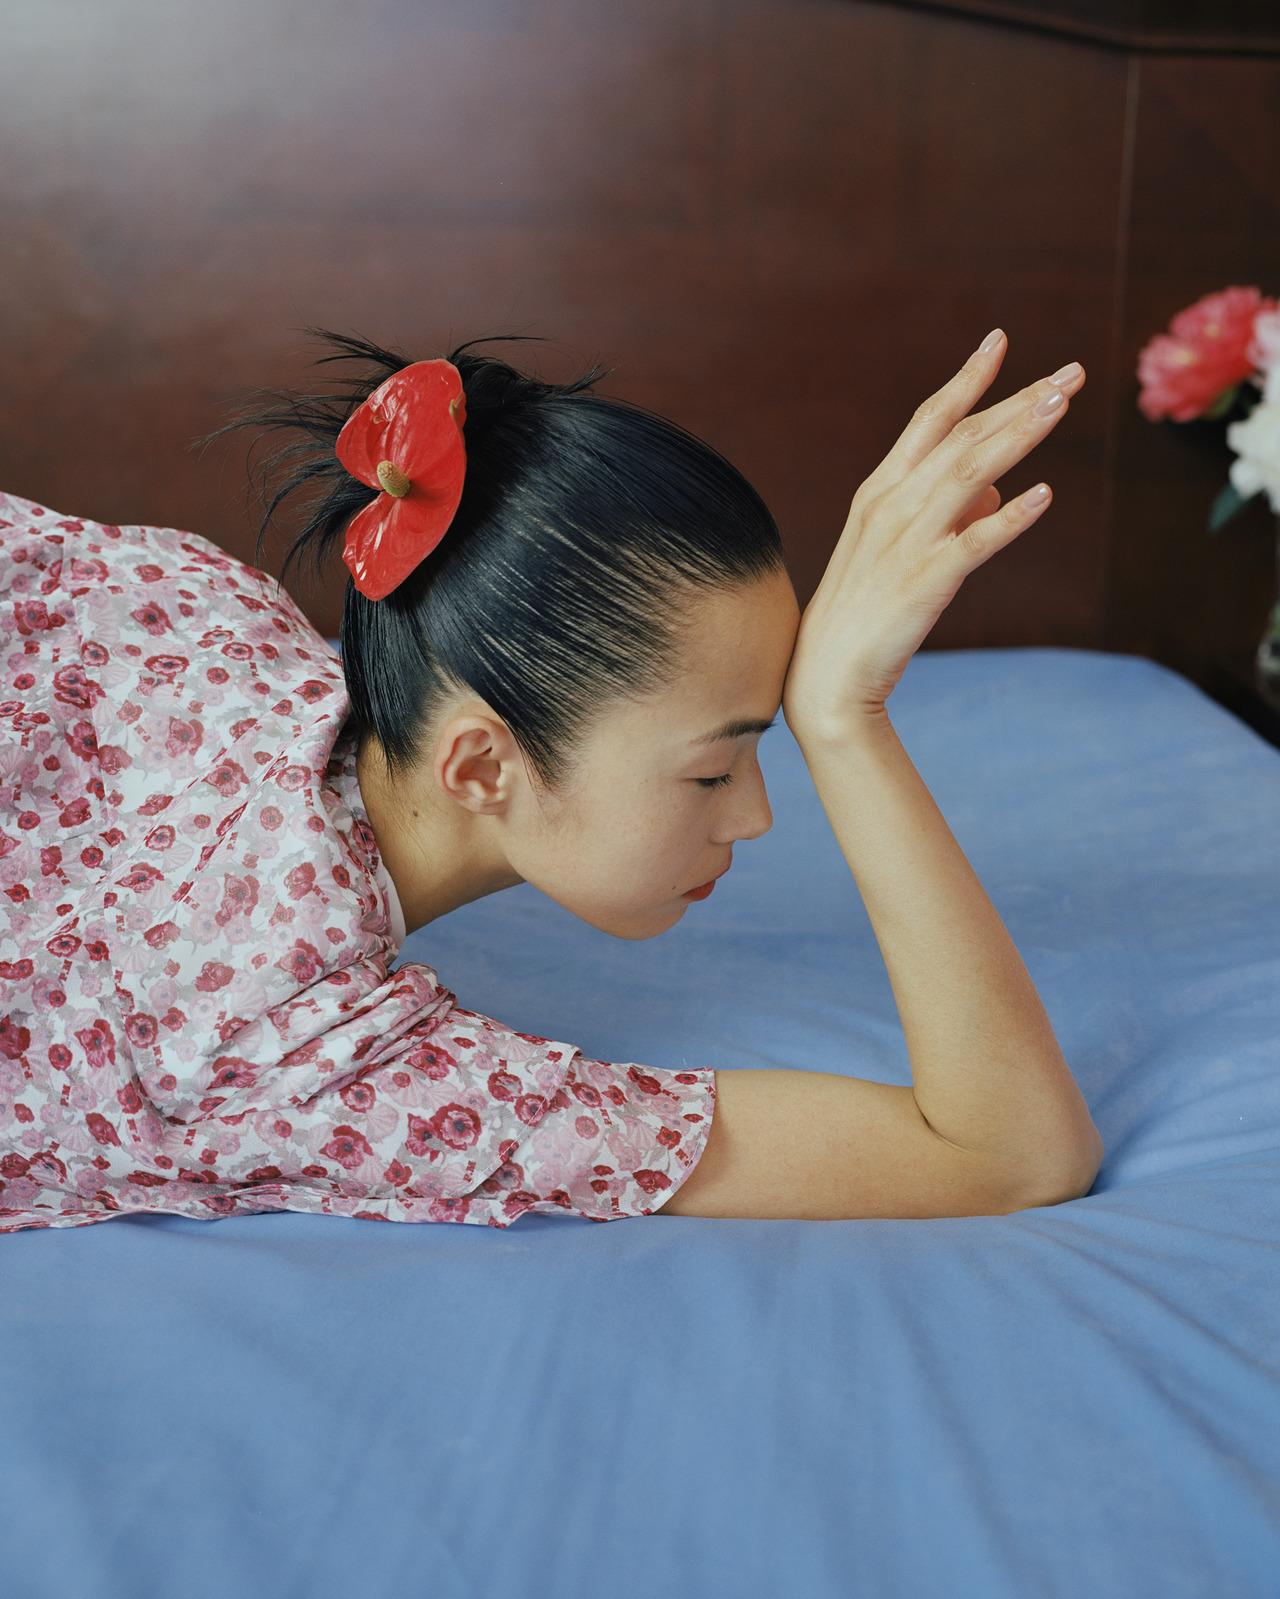 Leslie-Zhang-celebra-la-bellezza-cinese-nelle-sue-fotografie-Collater.al-13.jpg